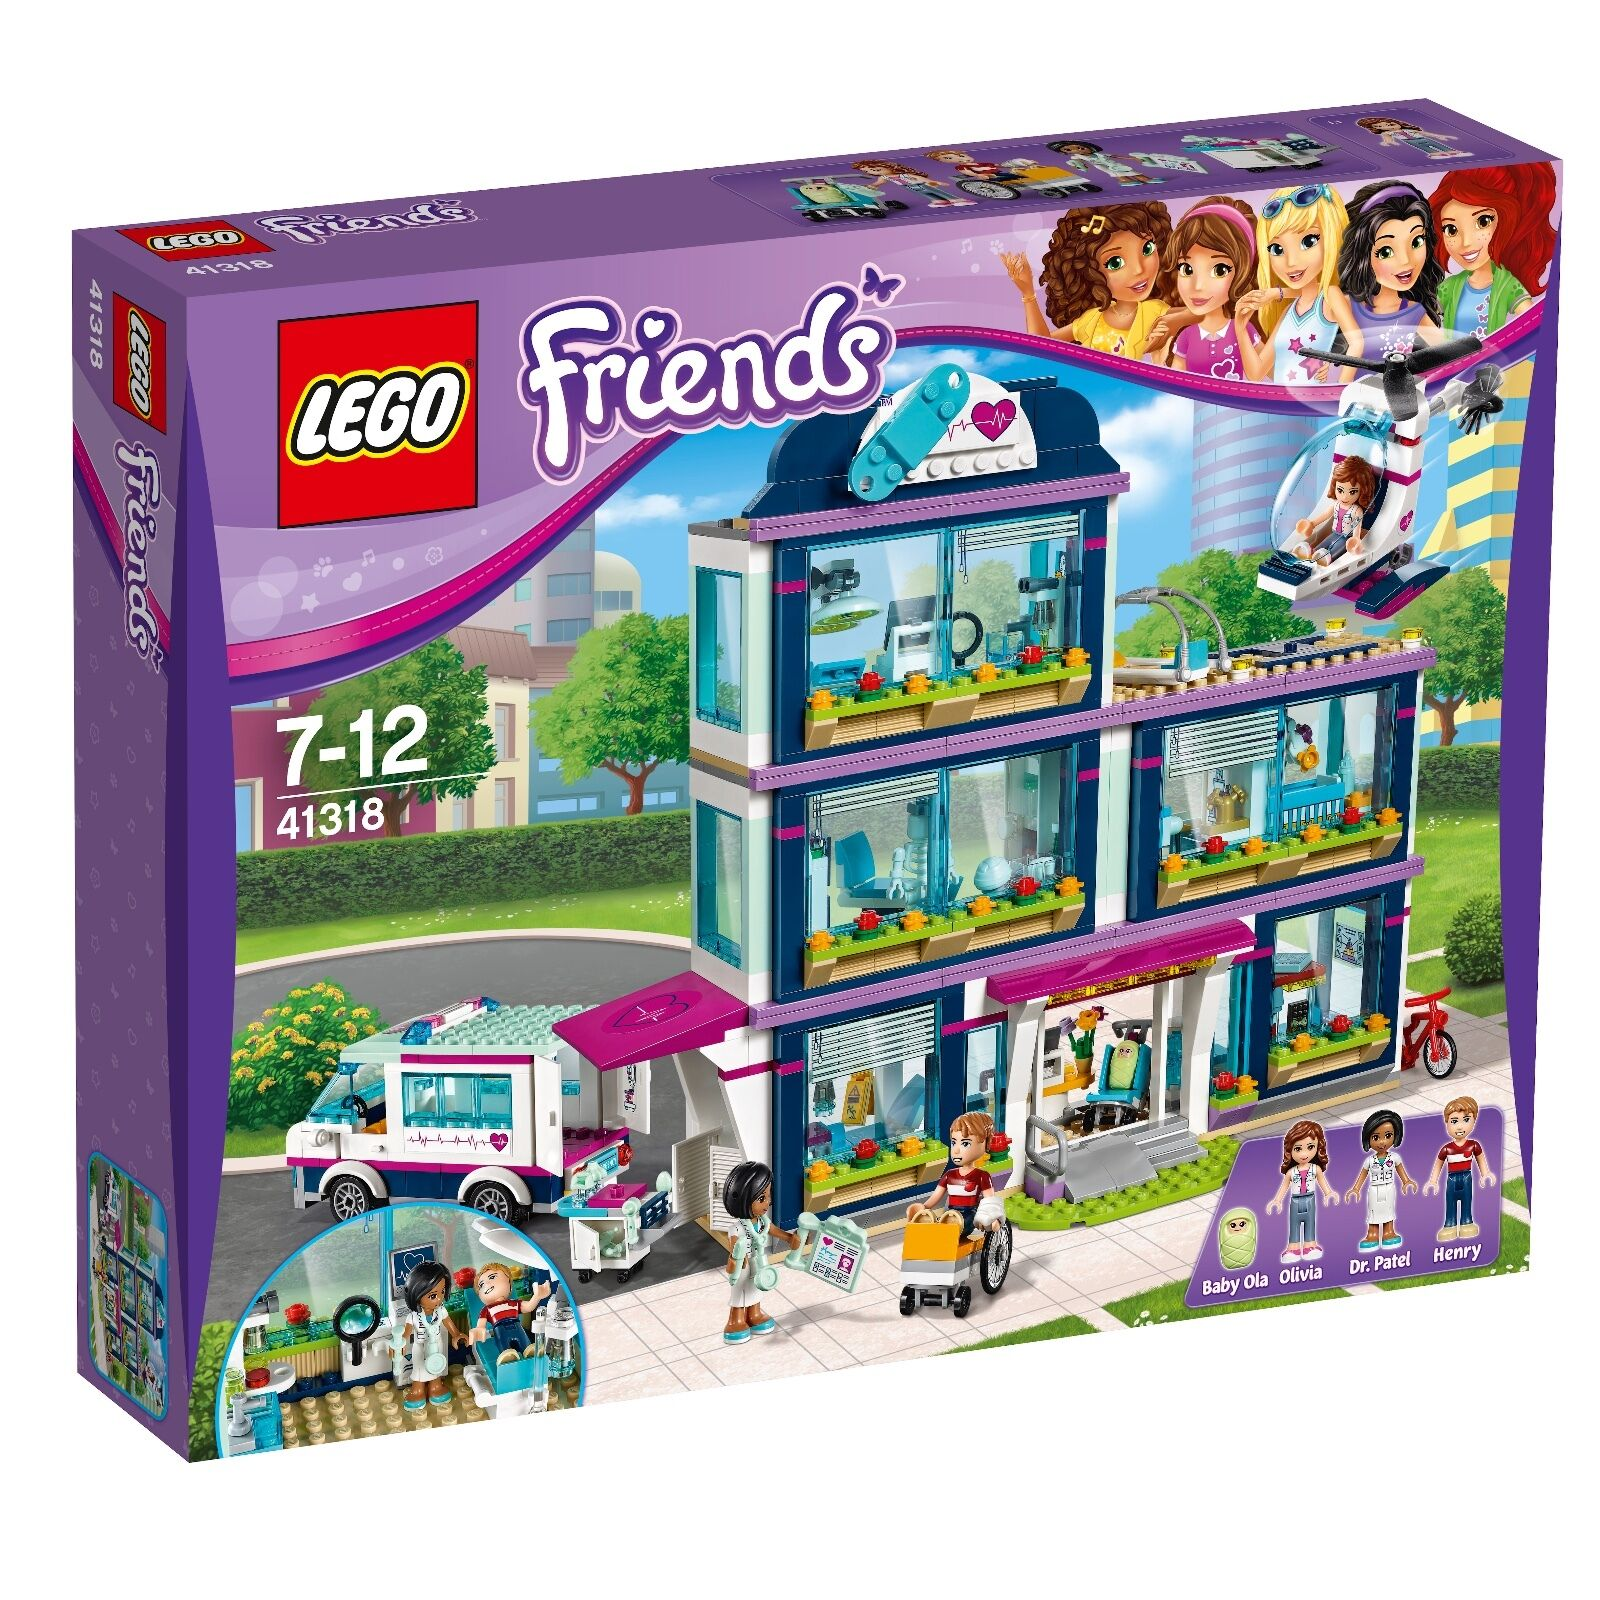 LEGO  ® Friends 41318 Heartlake ospedale NUOVO OVP _ Heartlake Hospital nuovo NRFB  consegna rapida